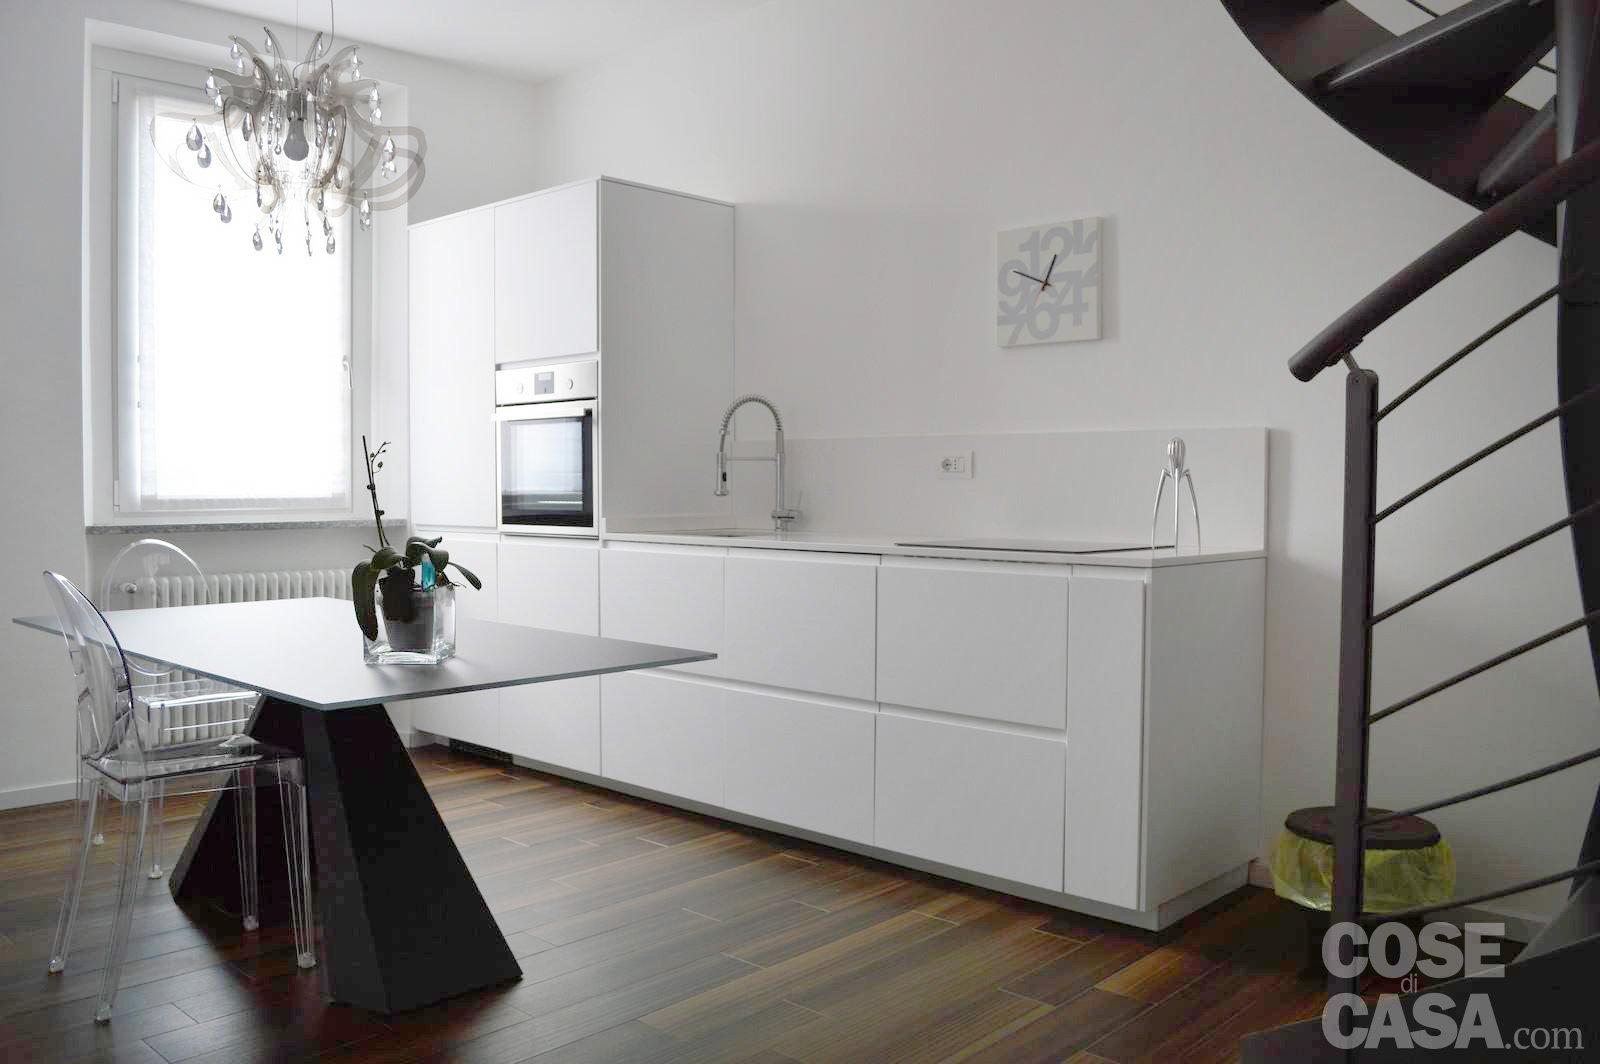 Piastrelle cucina ikea maniglie per mobili vendita on - Piastrelle cucina ikea ...